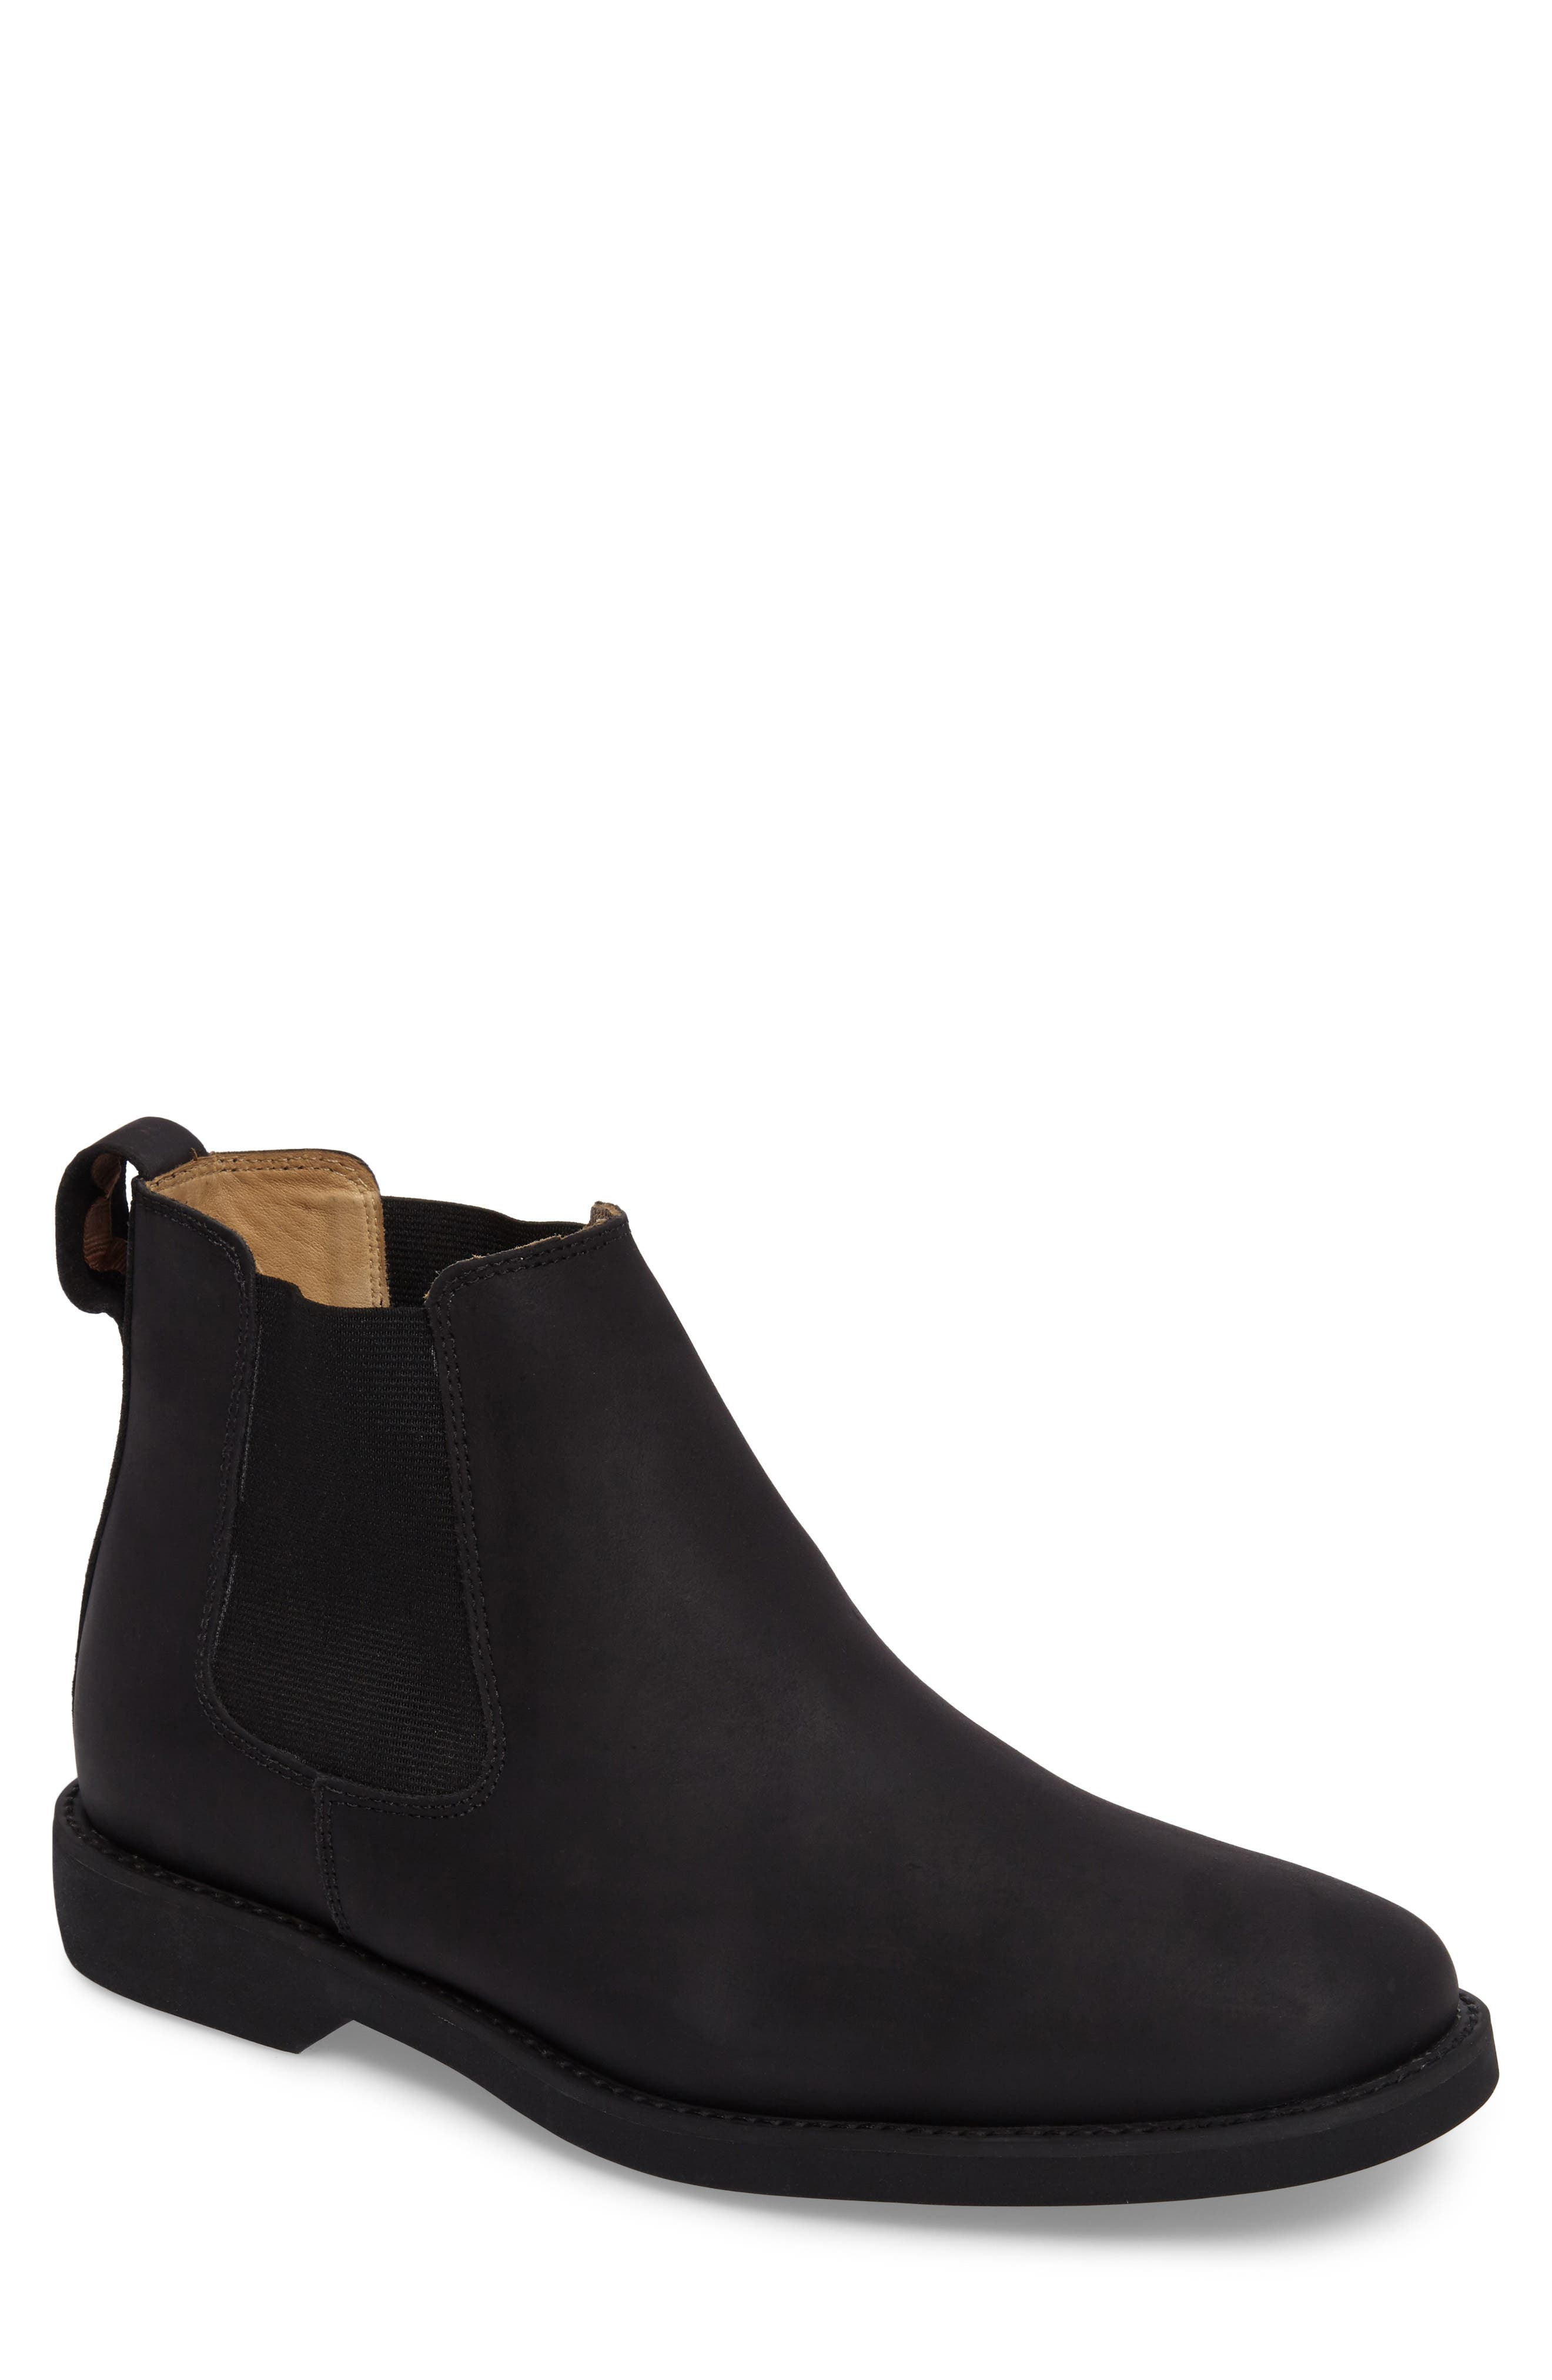 Cardoso Chelsea Boot,                         Main,                         color, 005